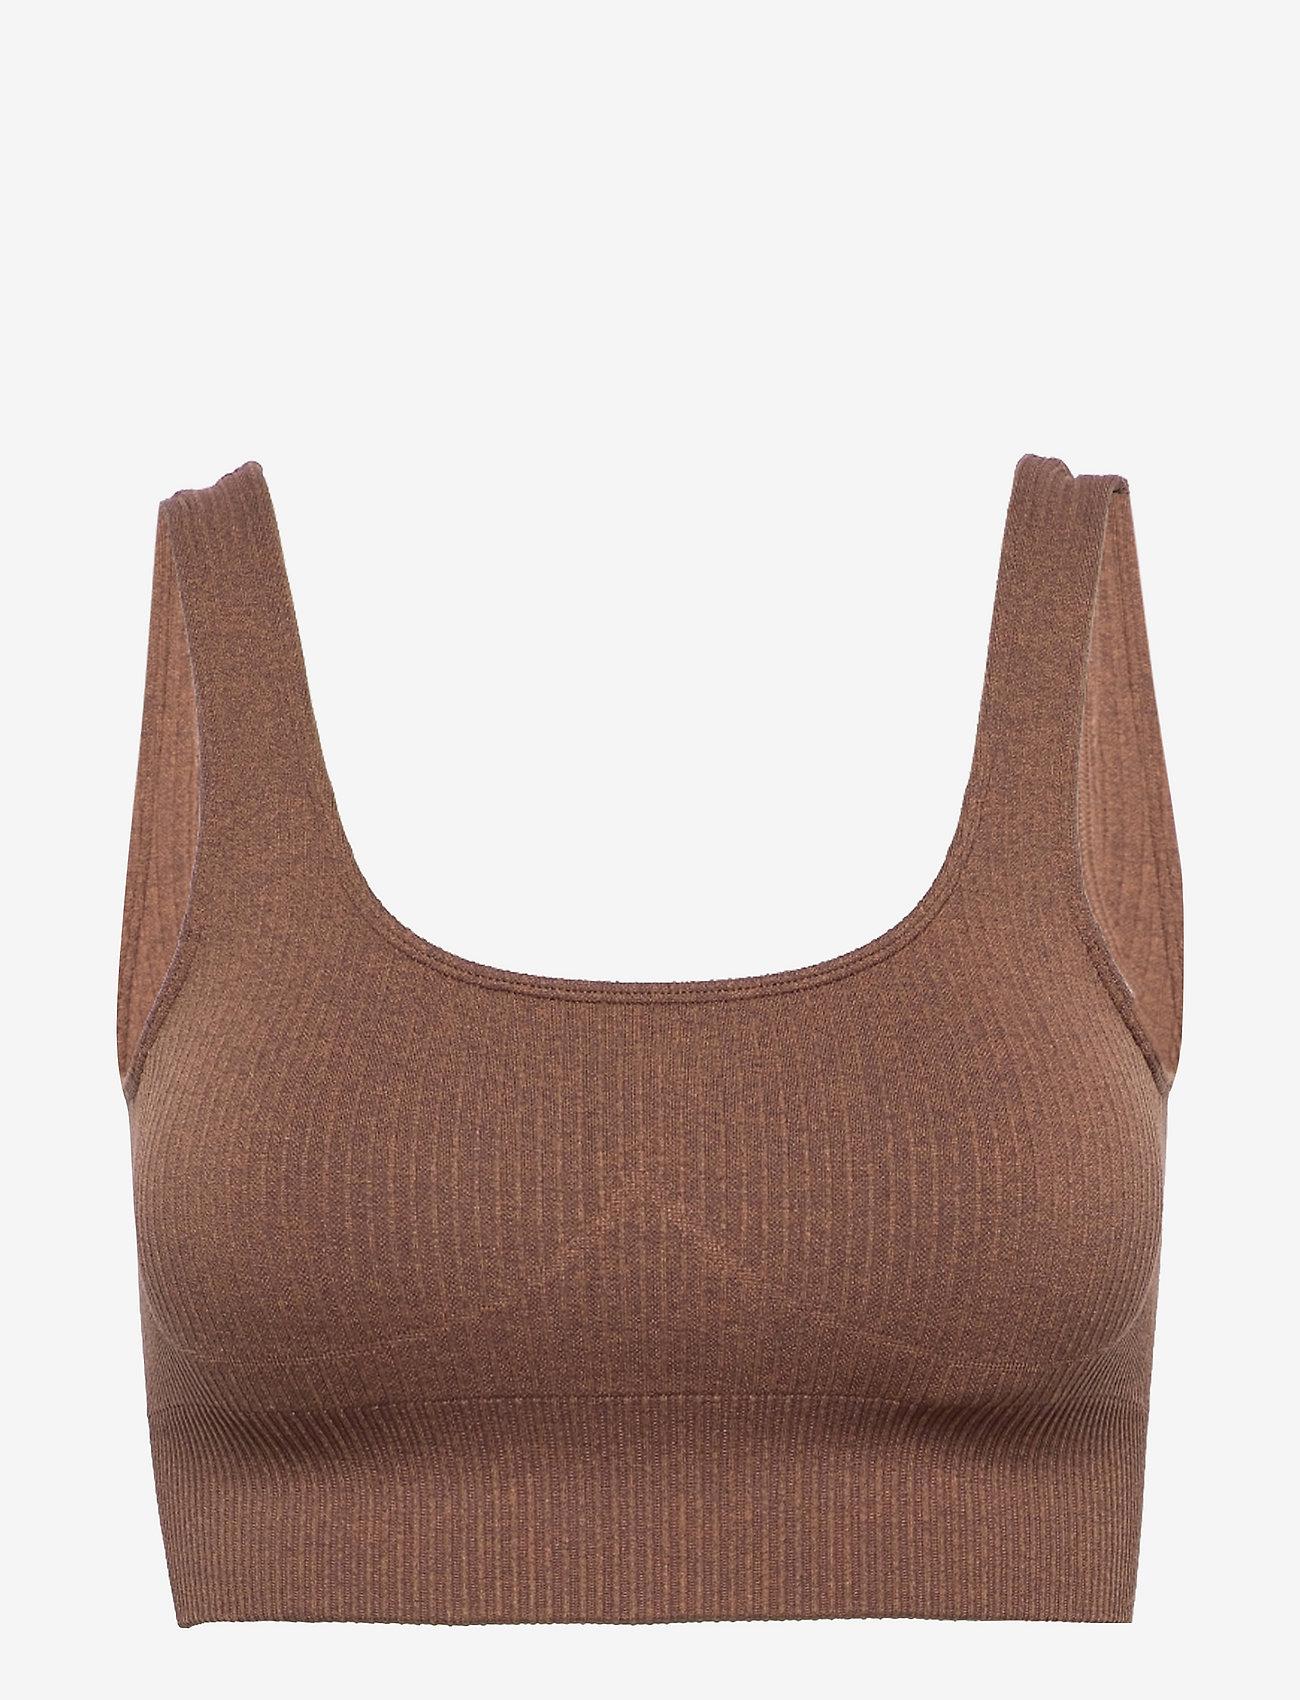 AIM'N - Bronze Ribbed Seamless Bra - sport bras: medium support - bronze - 1